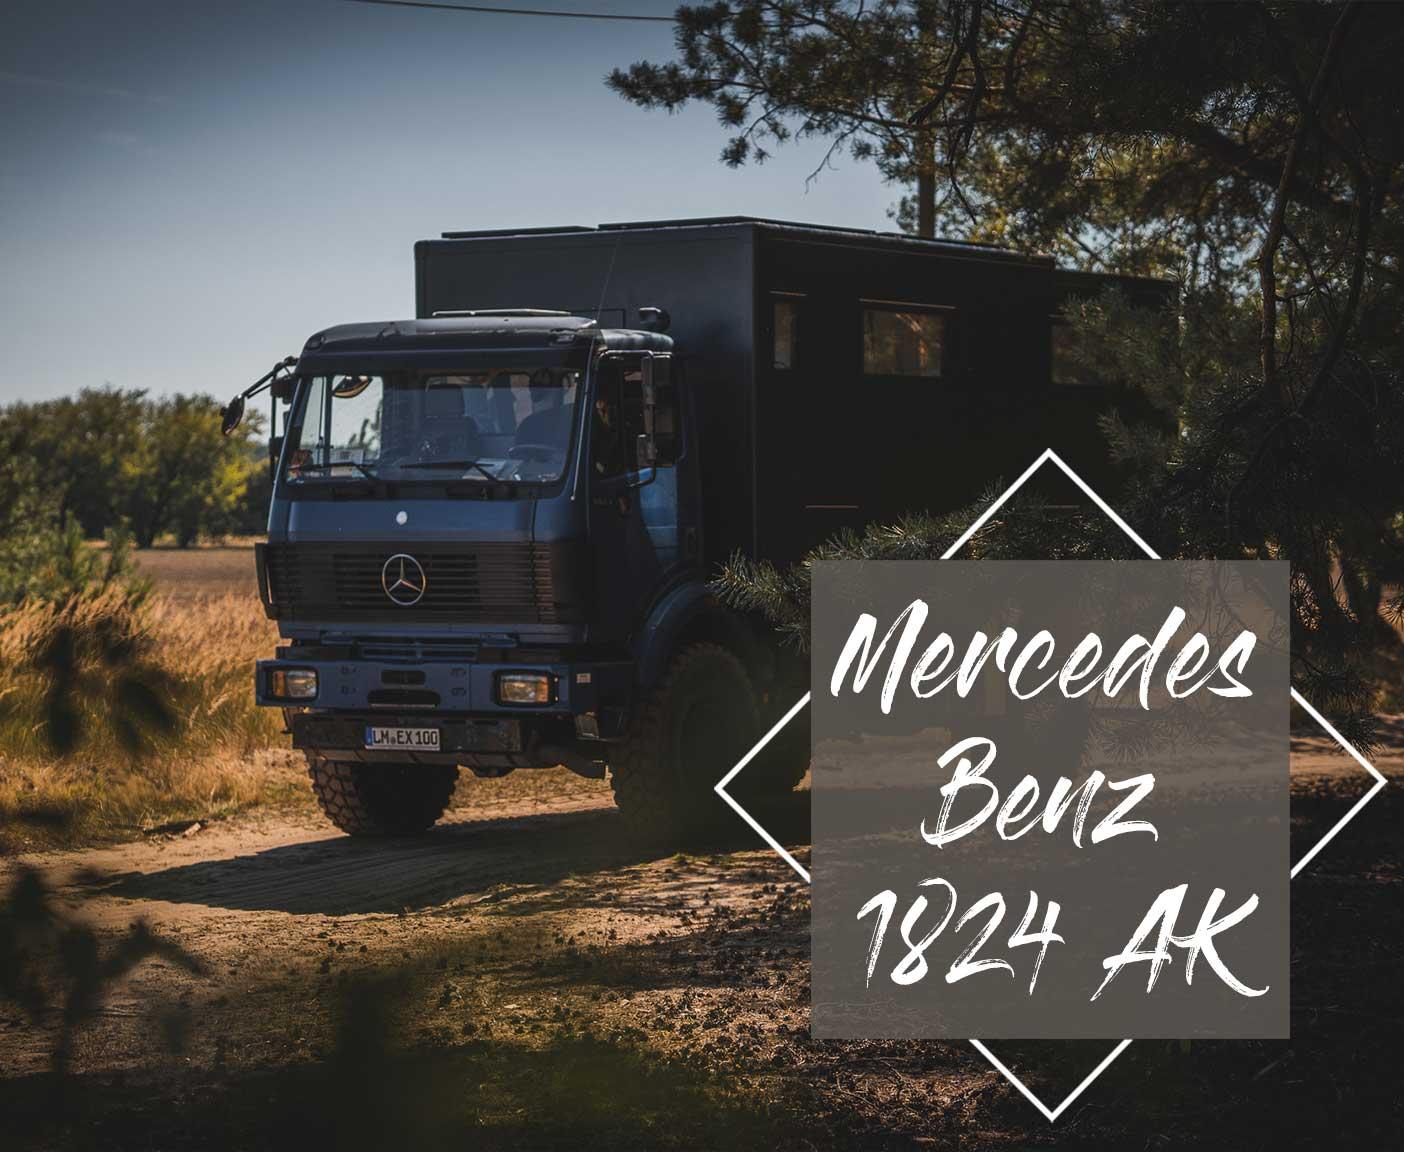 Mercedes Benz 1824 AK - Digitale Nomaden im Expeditionsmobil